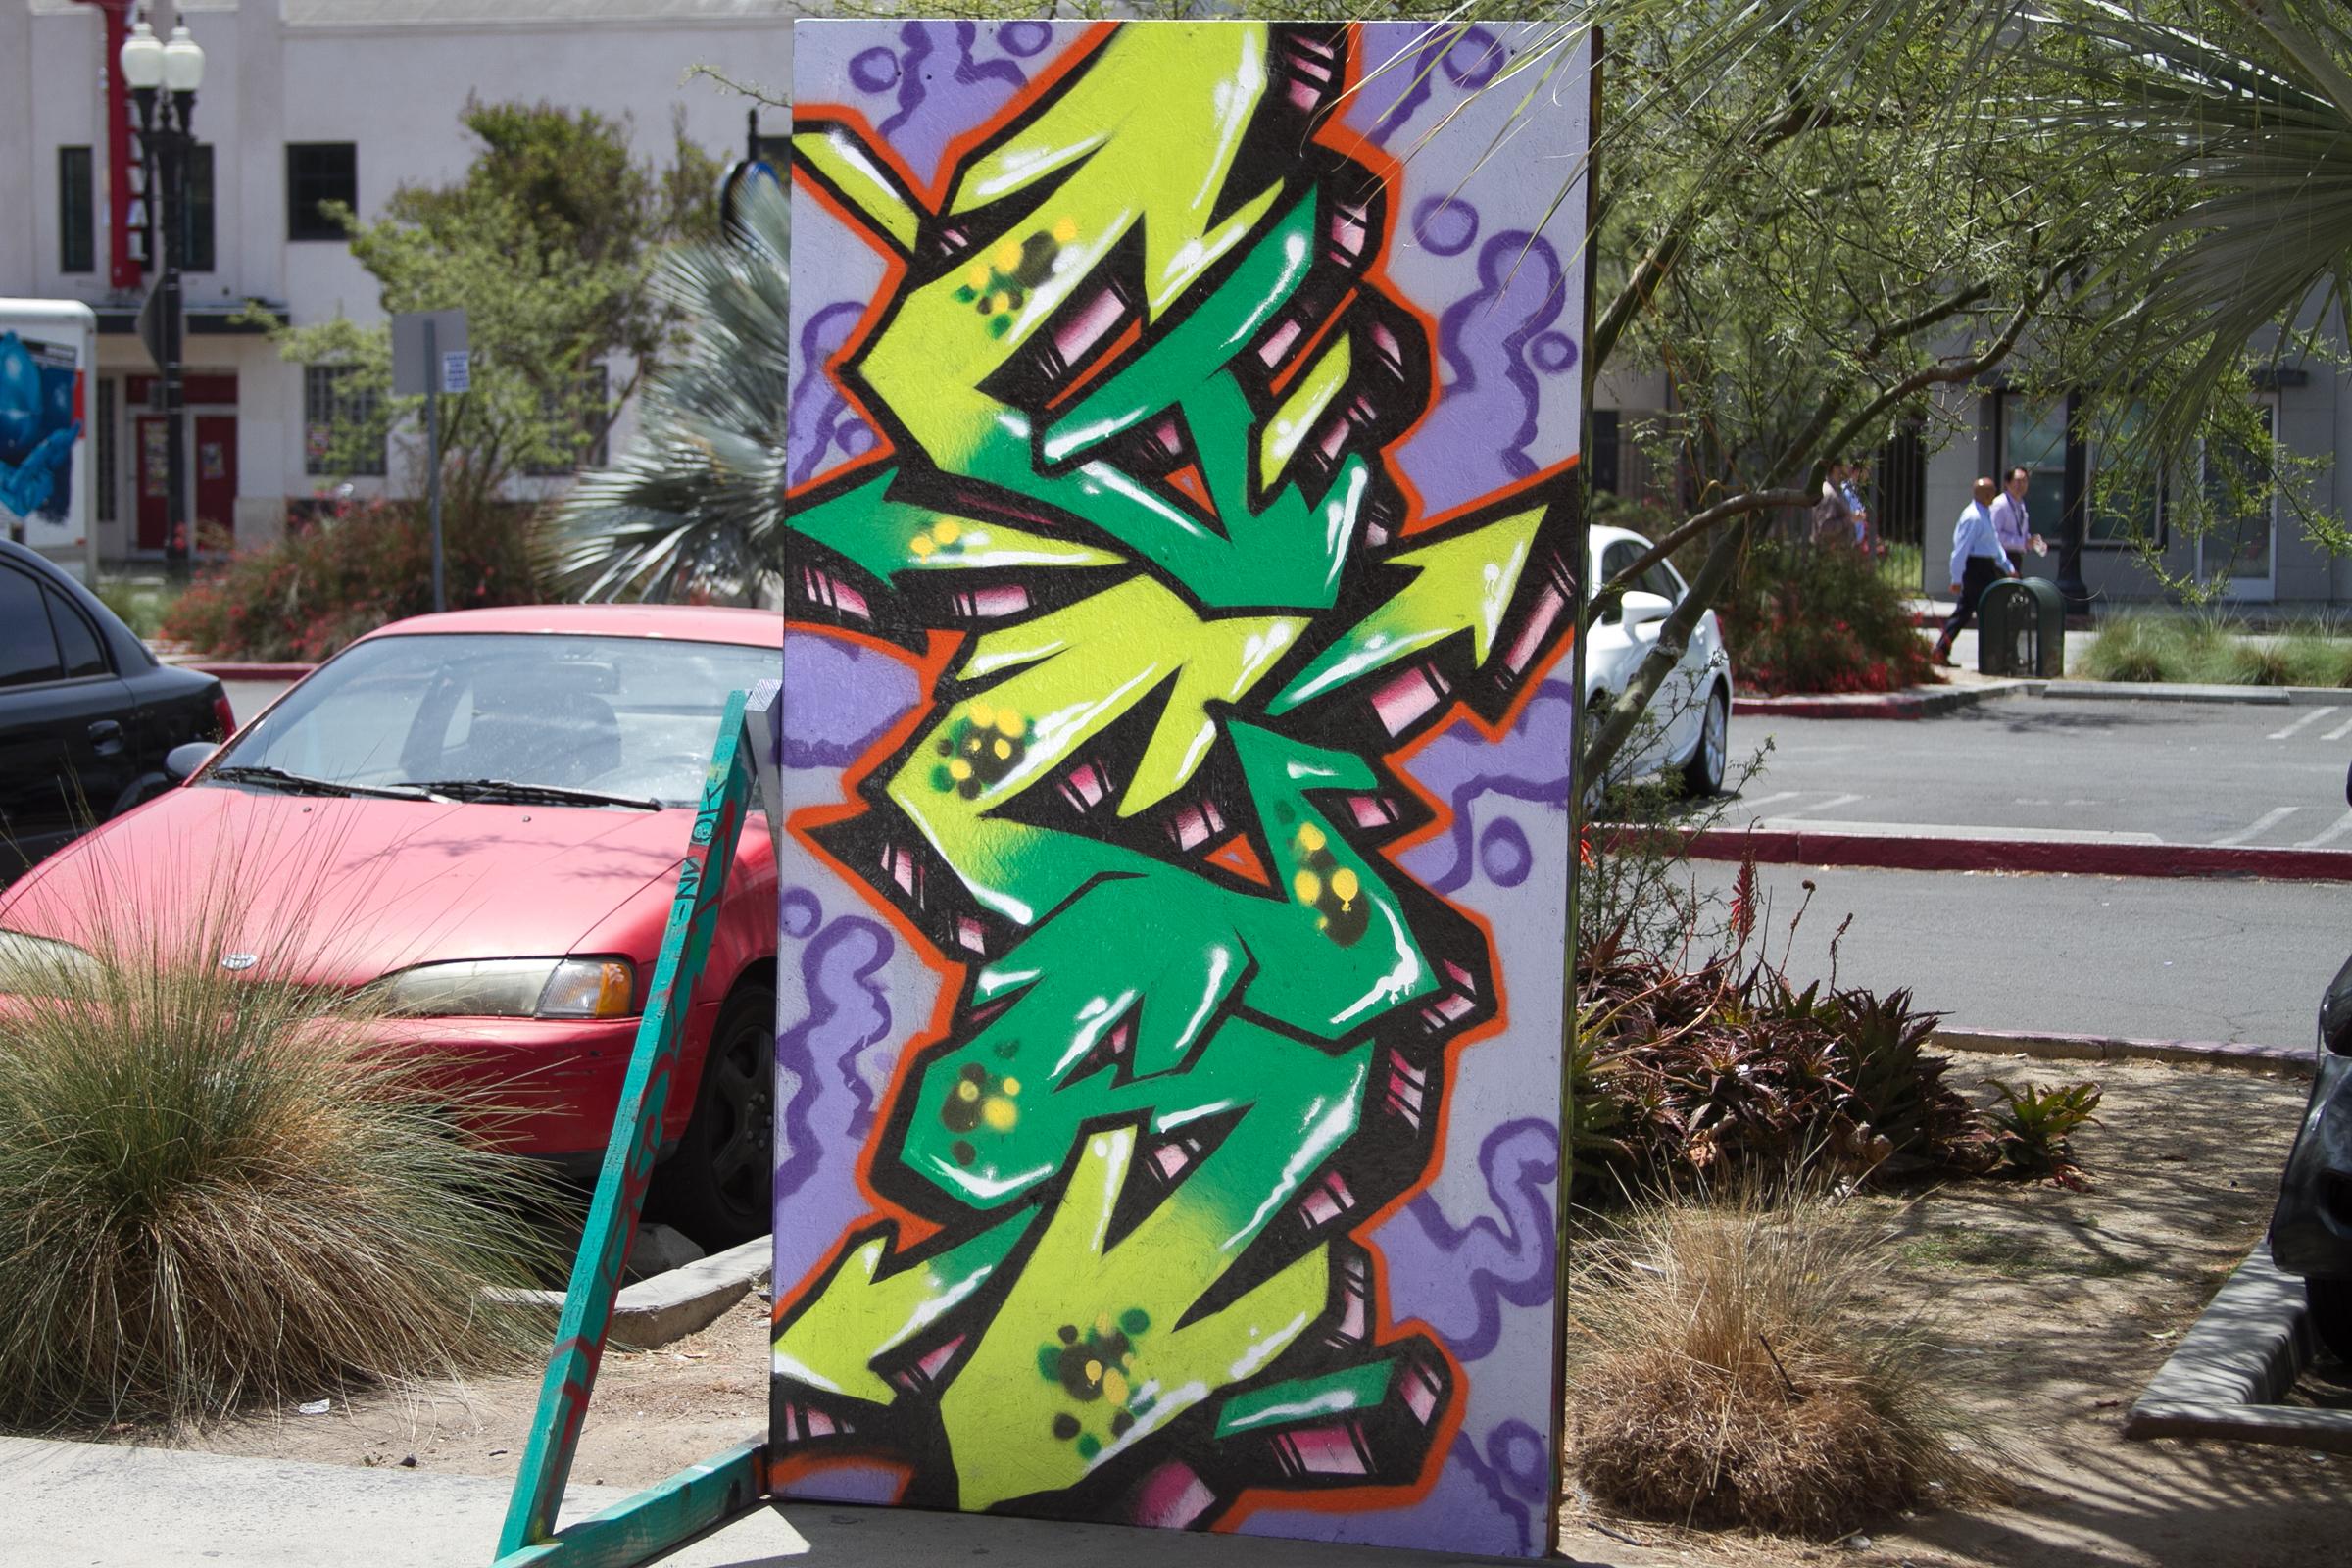 GCS graffiti piece Santa Ana